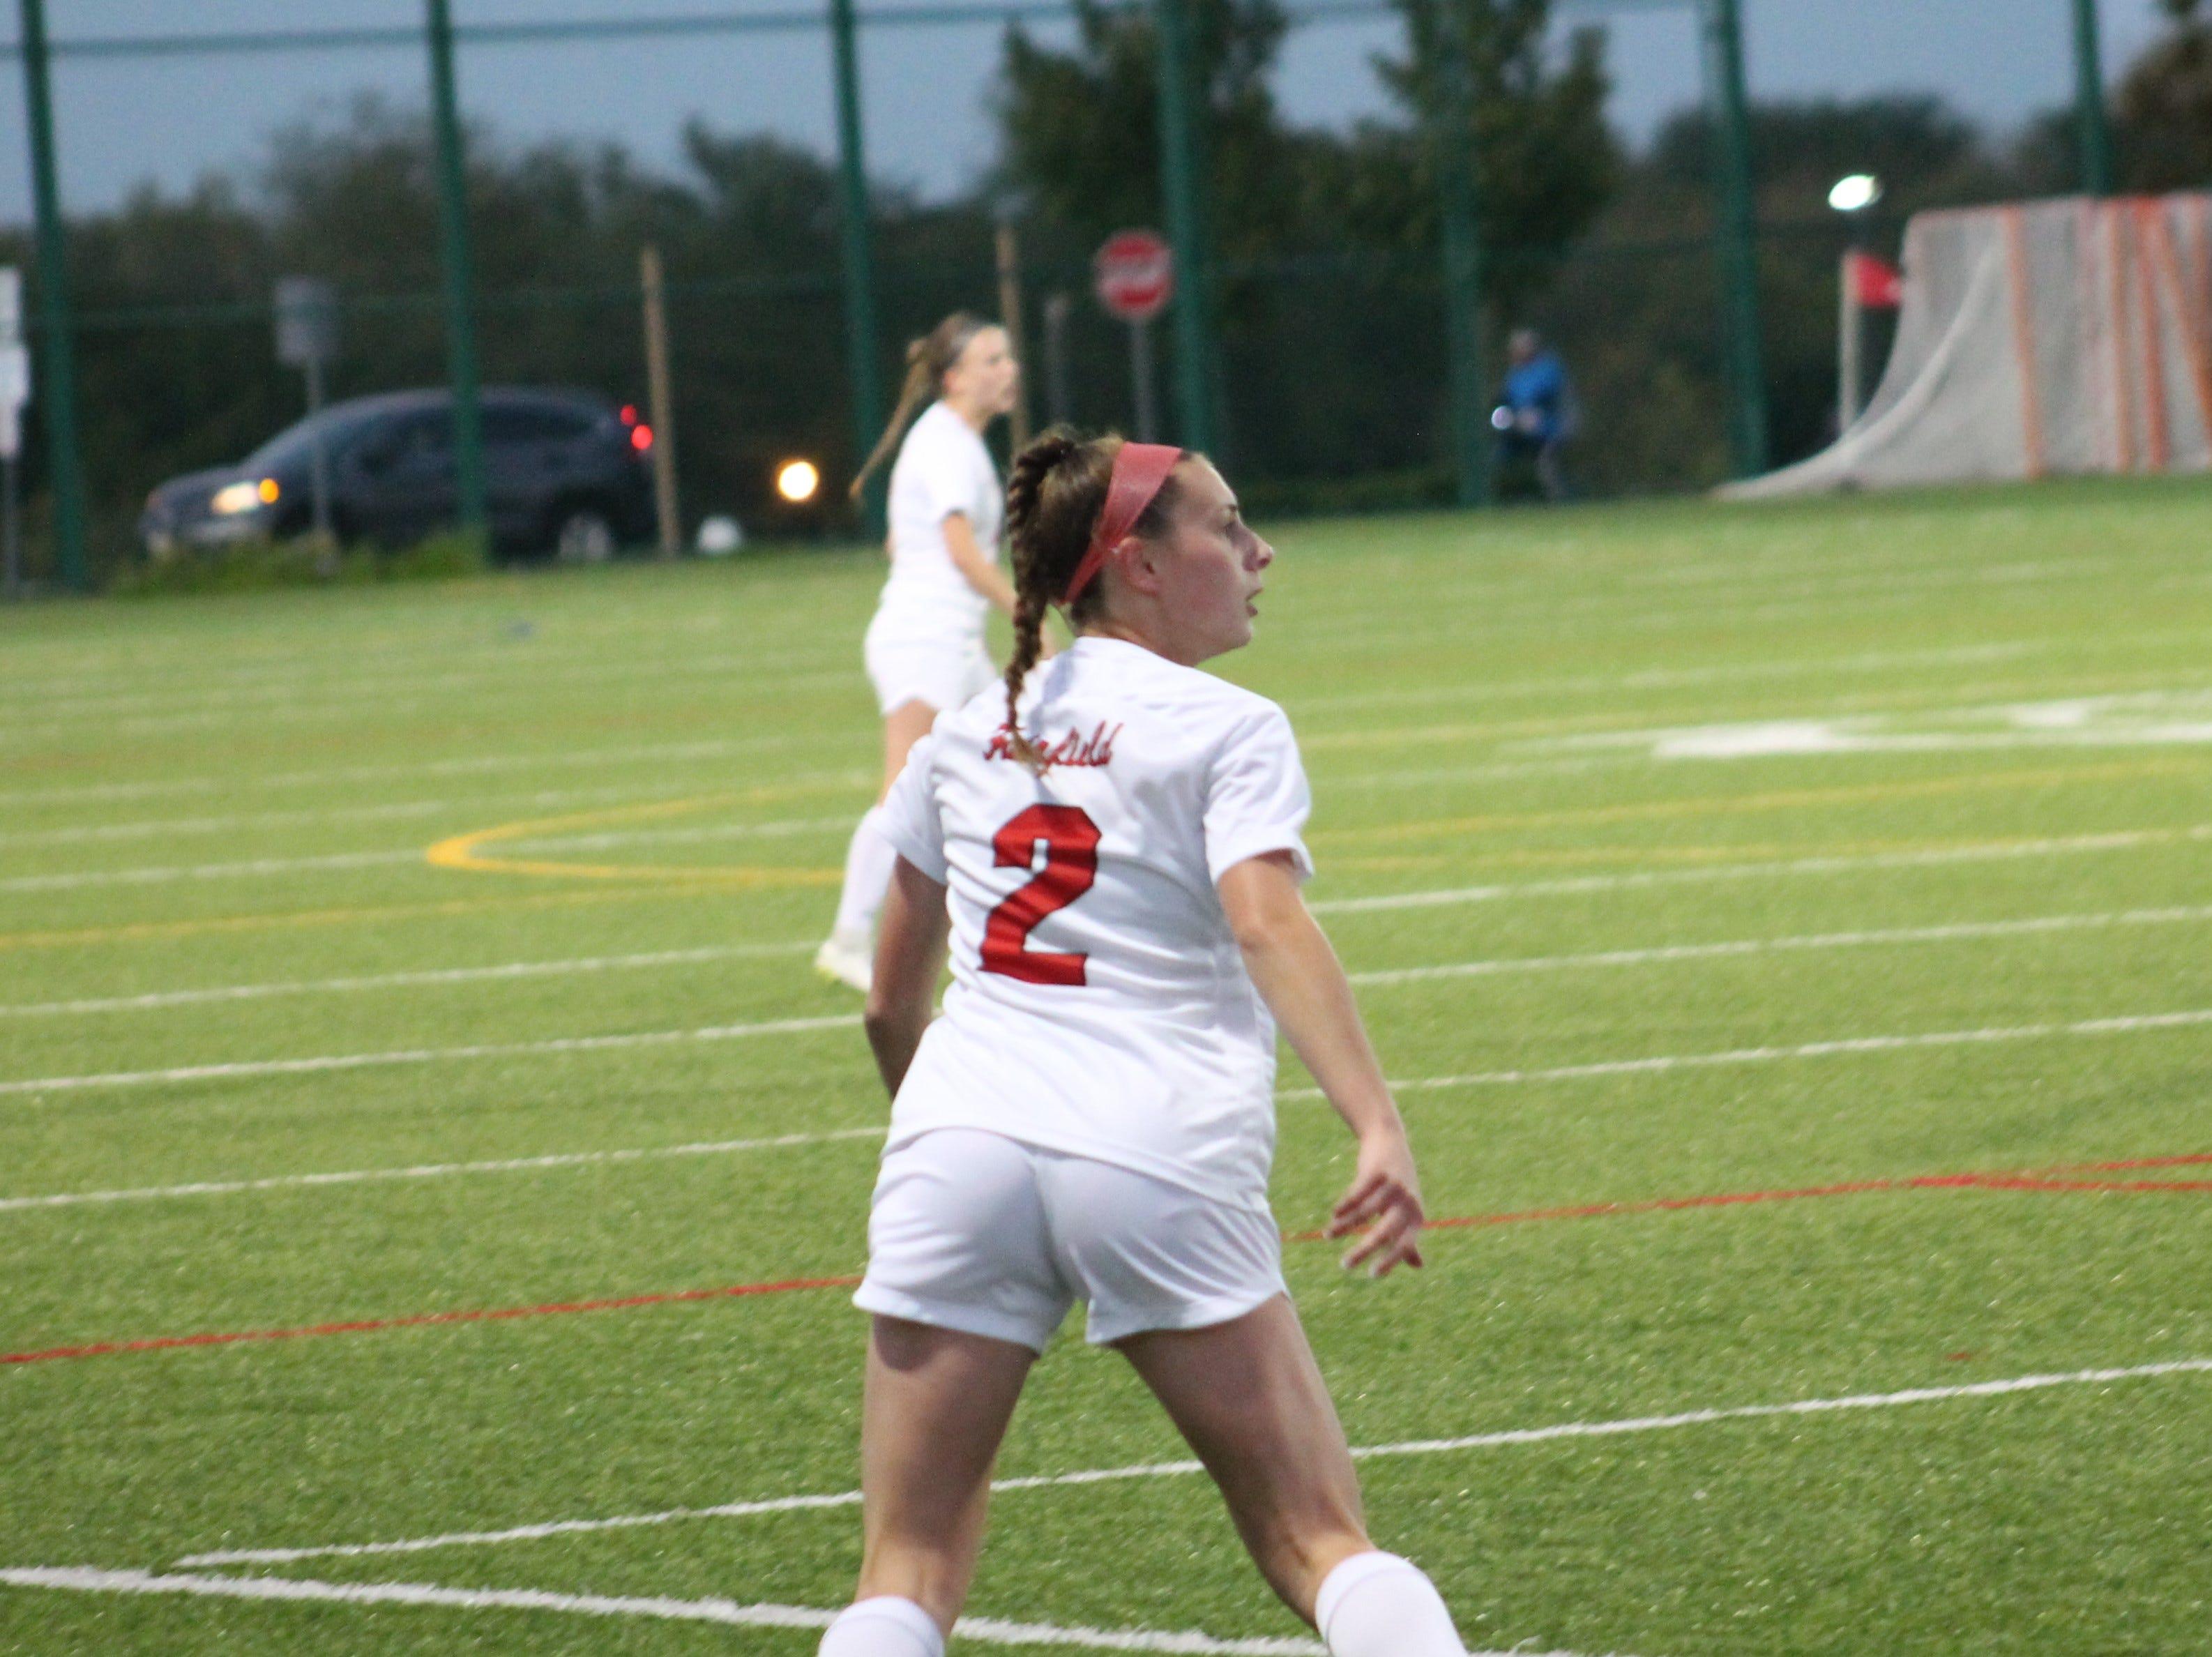 Fairfield junior midfielder Rachel Smith awaits a pass